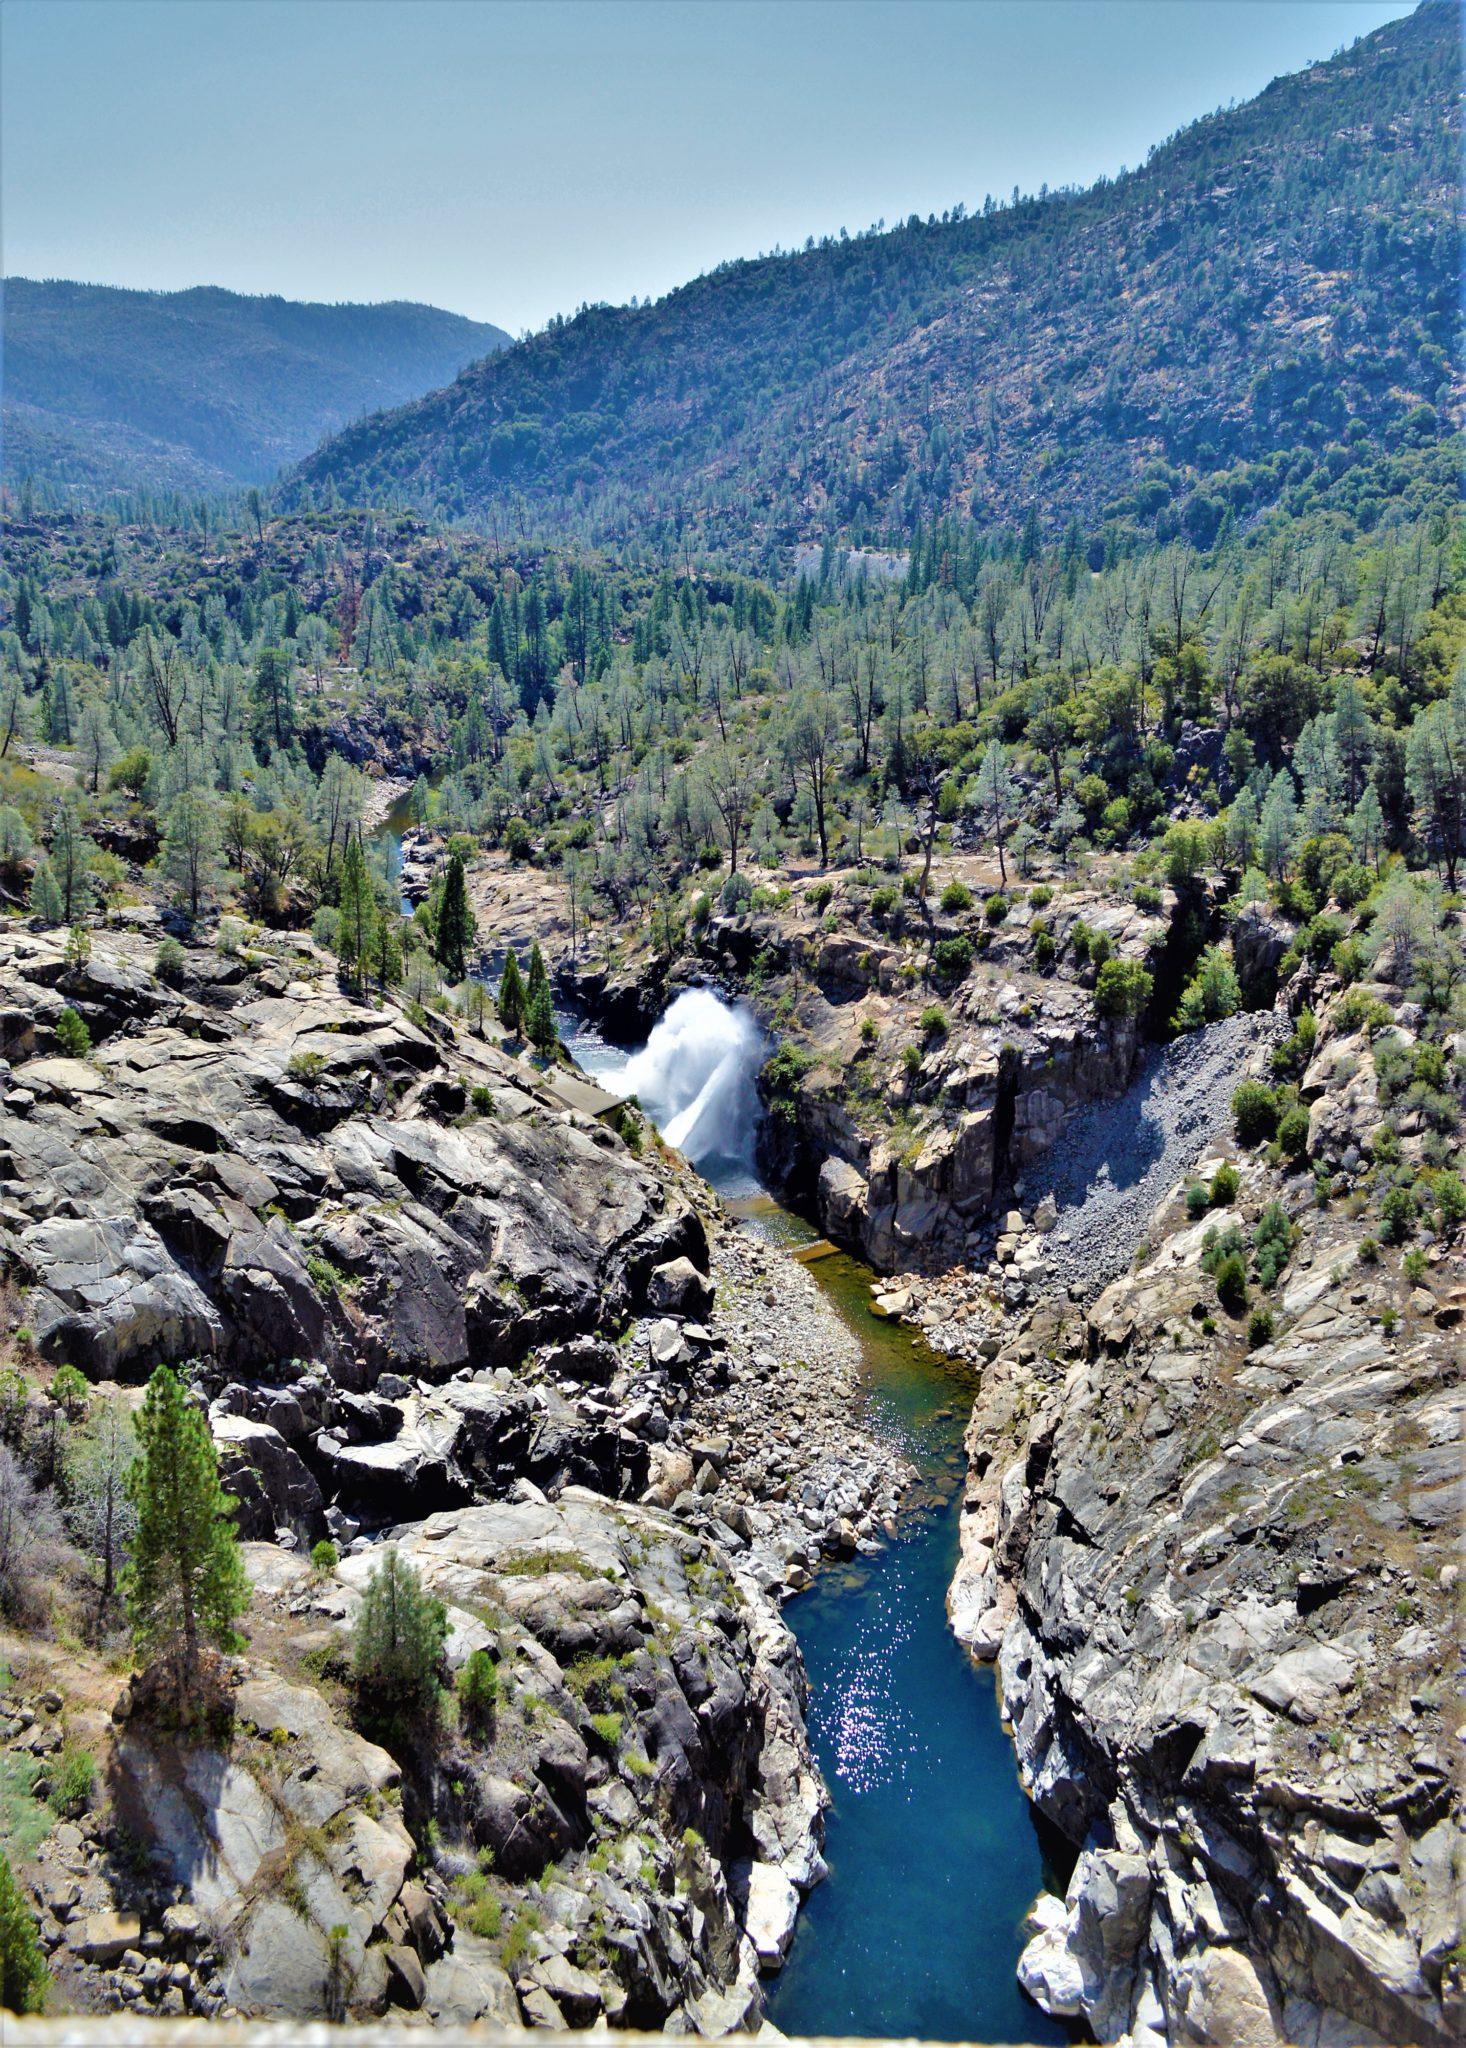 Hydro power, Hetch Hetchy dam, California